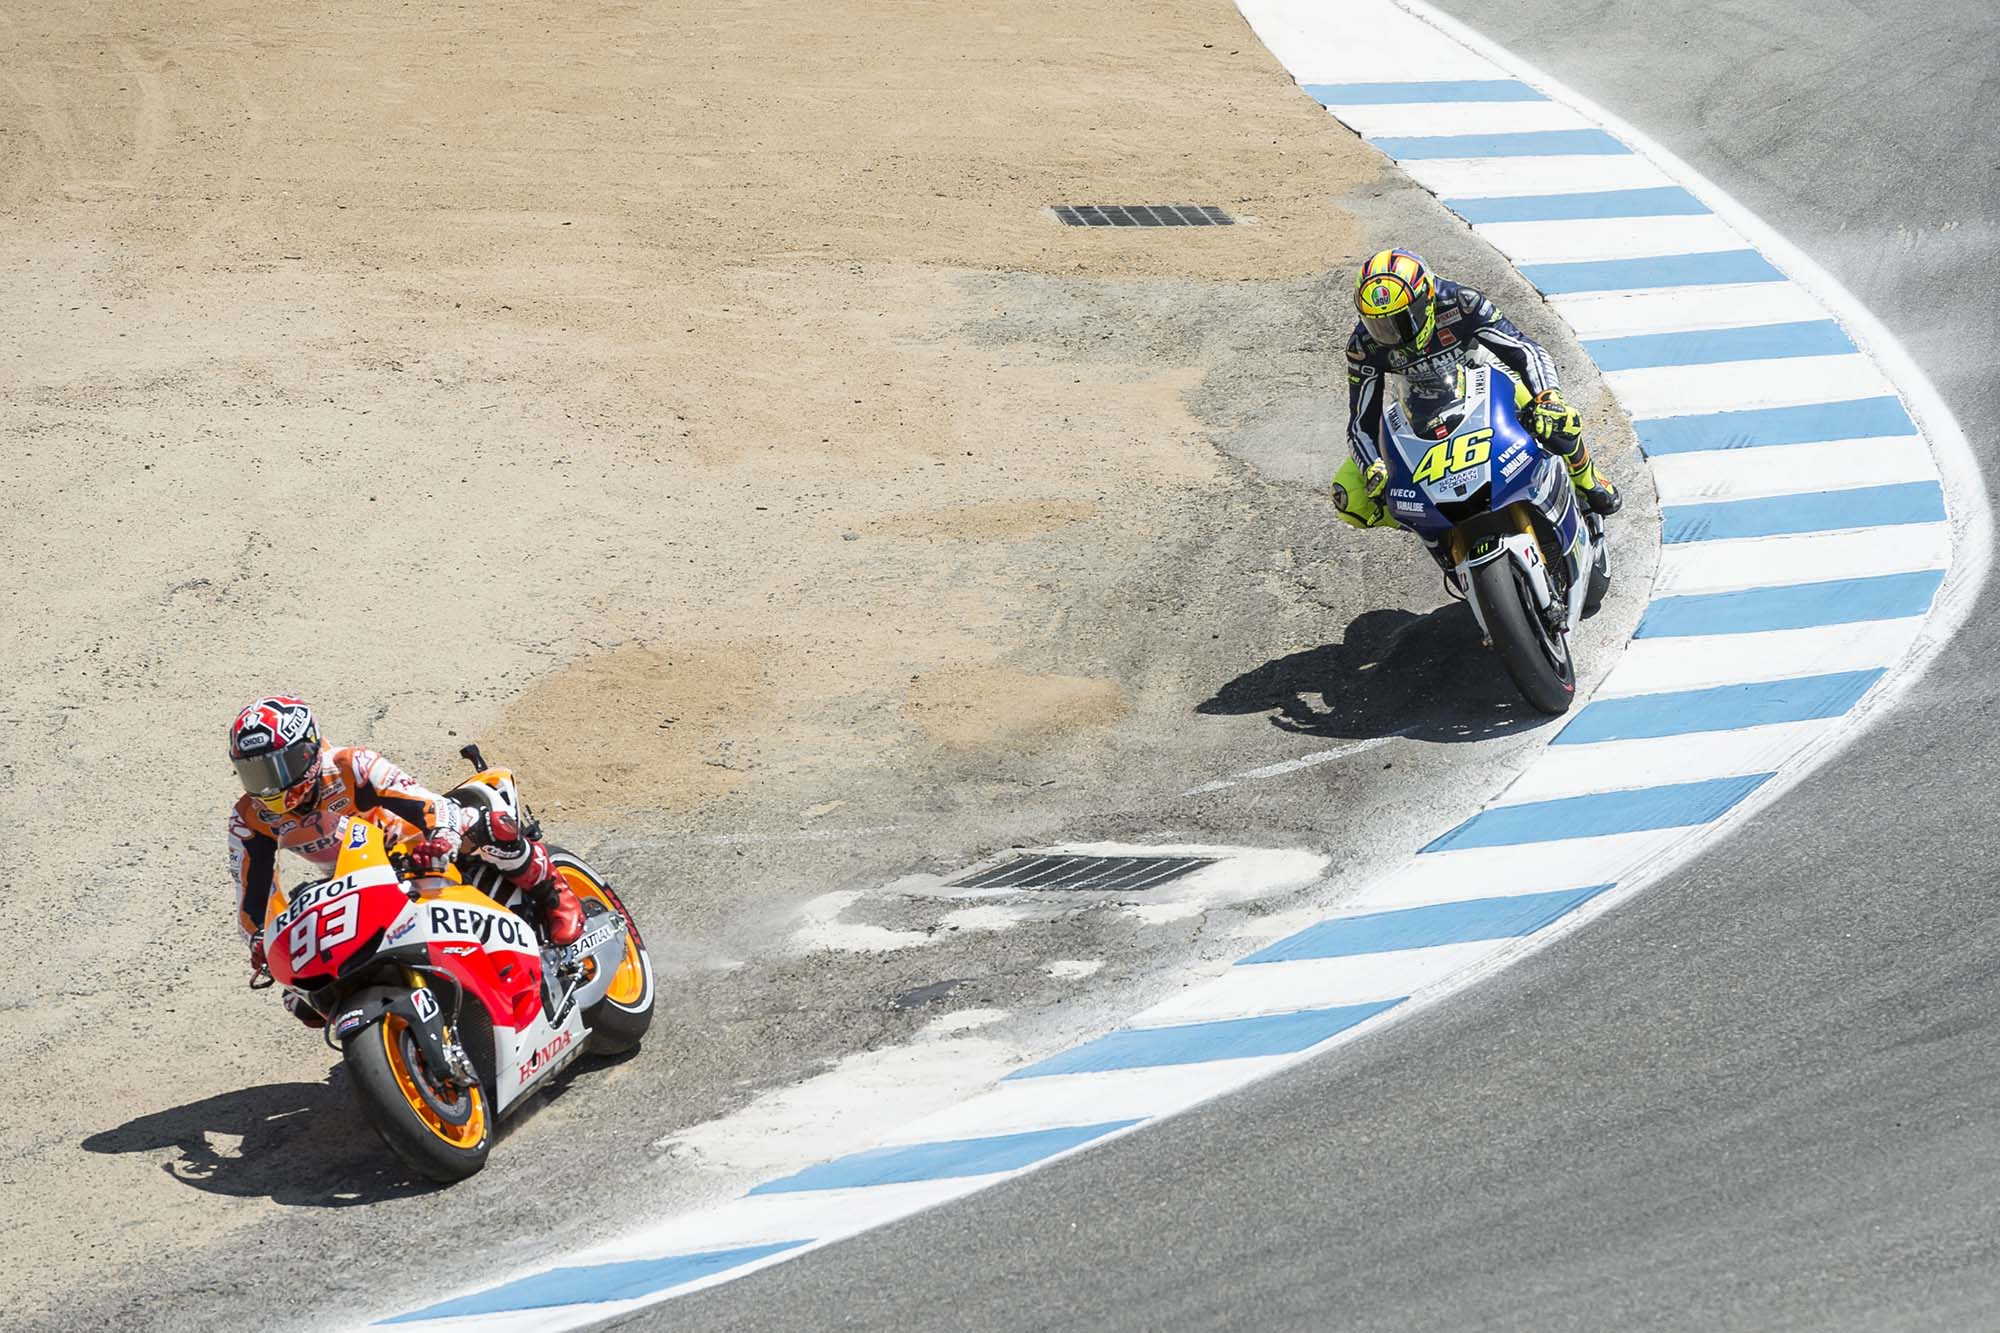 GP Laguna Seca - Page 3 Marc-Marquez-Valentino-Rossi-Laguna-Seca-Corkscrew-Pass-Kevin-Warren-6